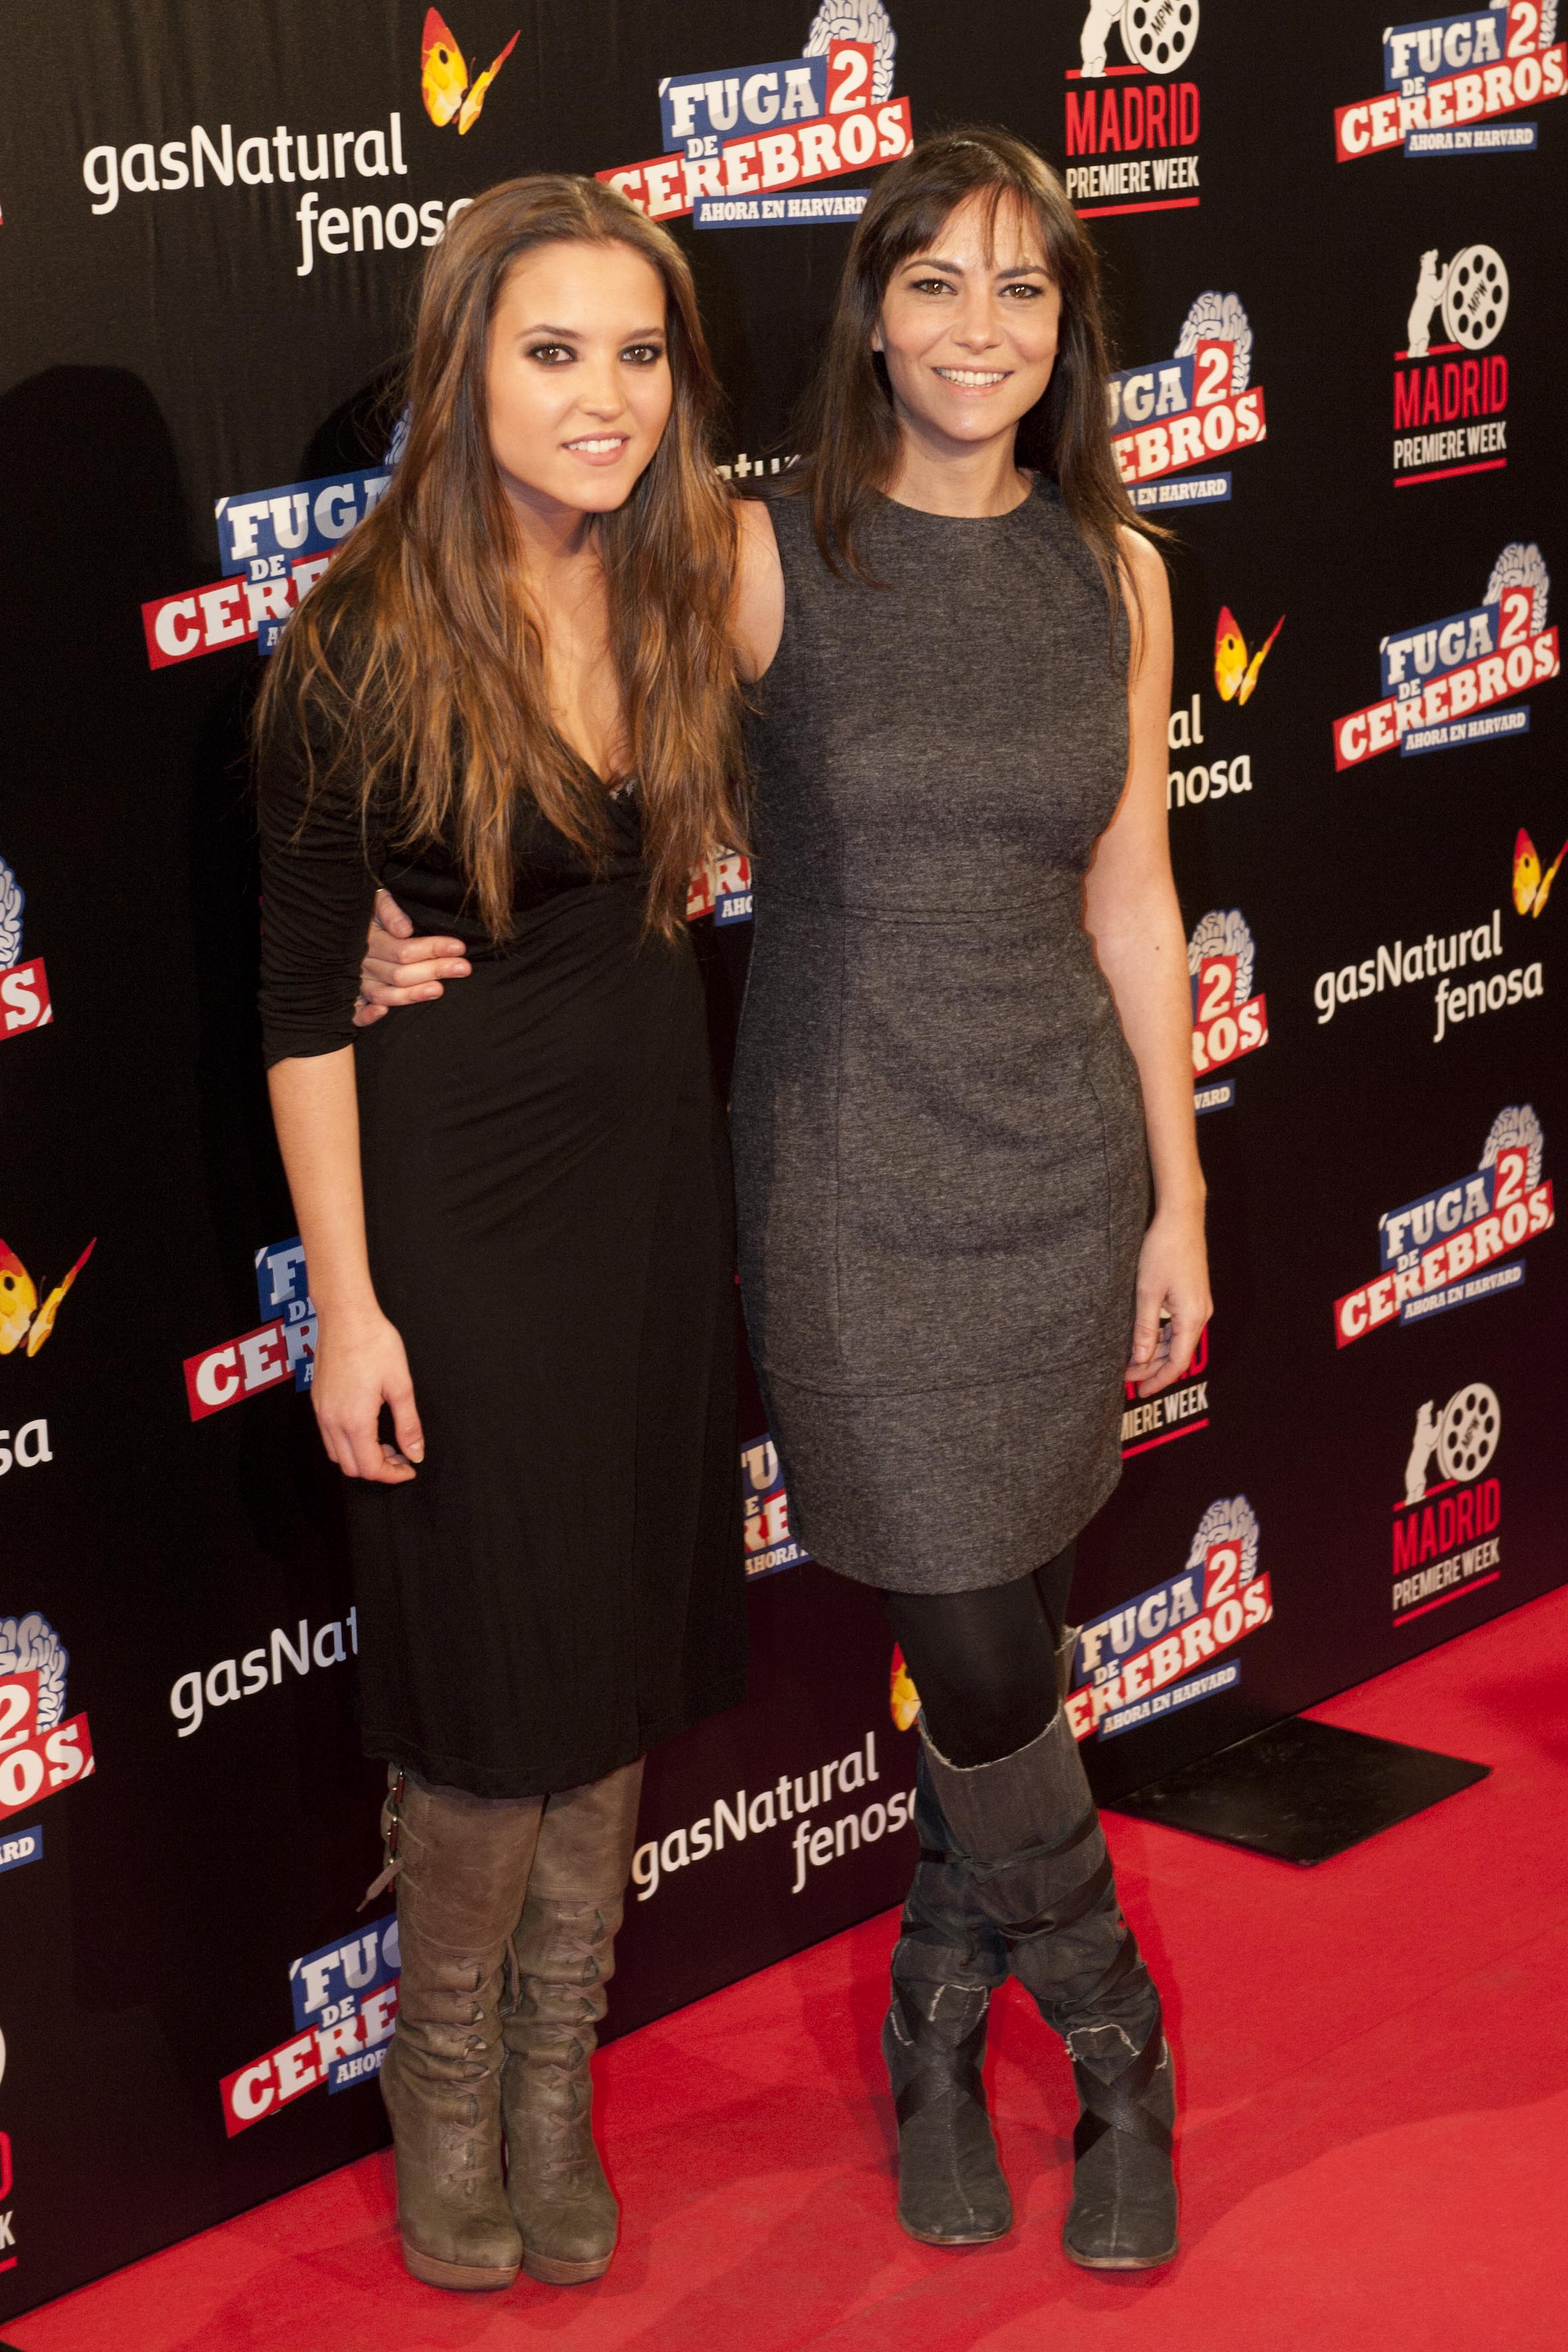 Ana Fernández y Sandra Collantes